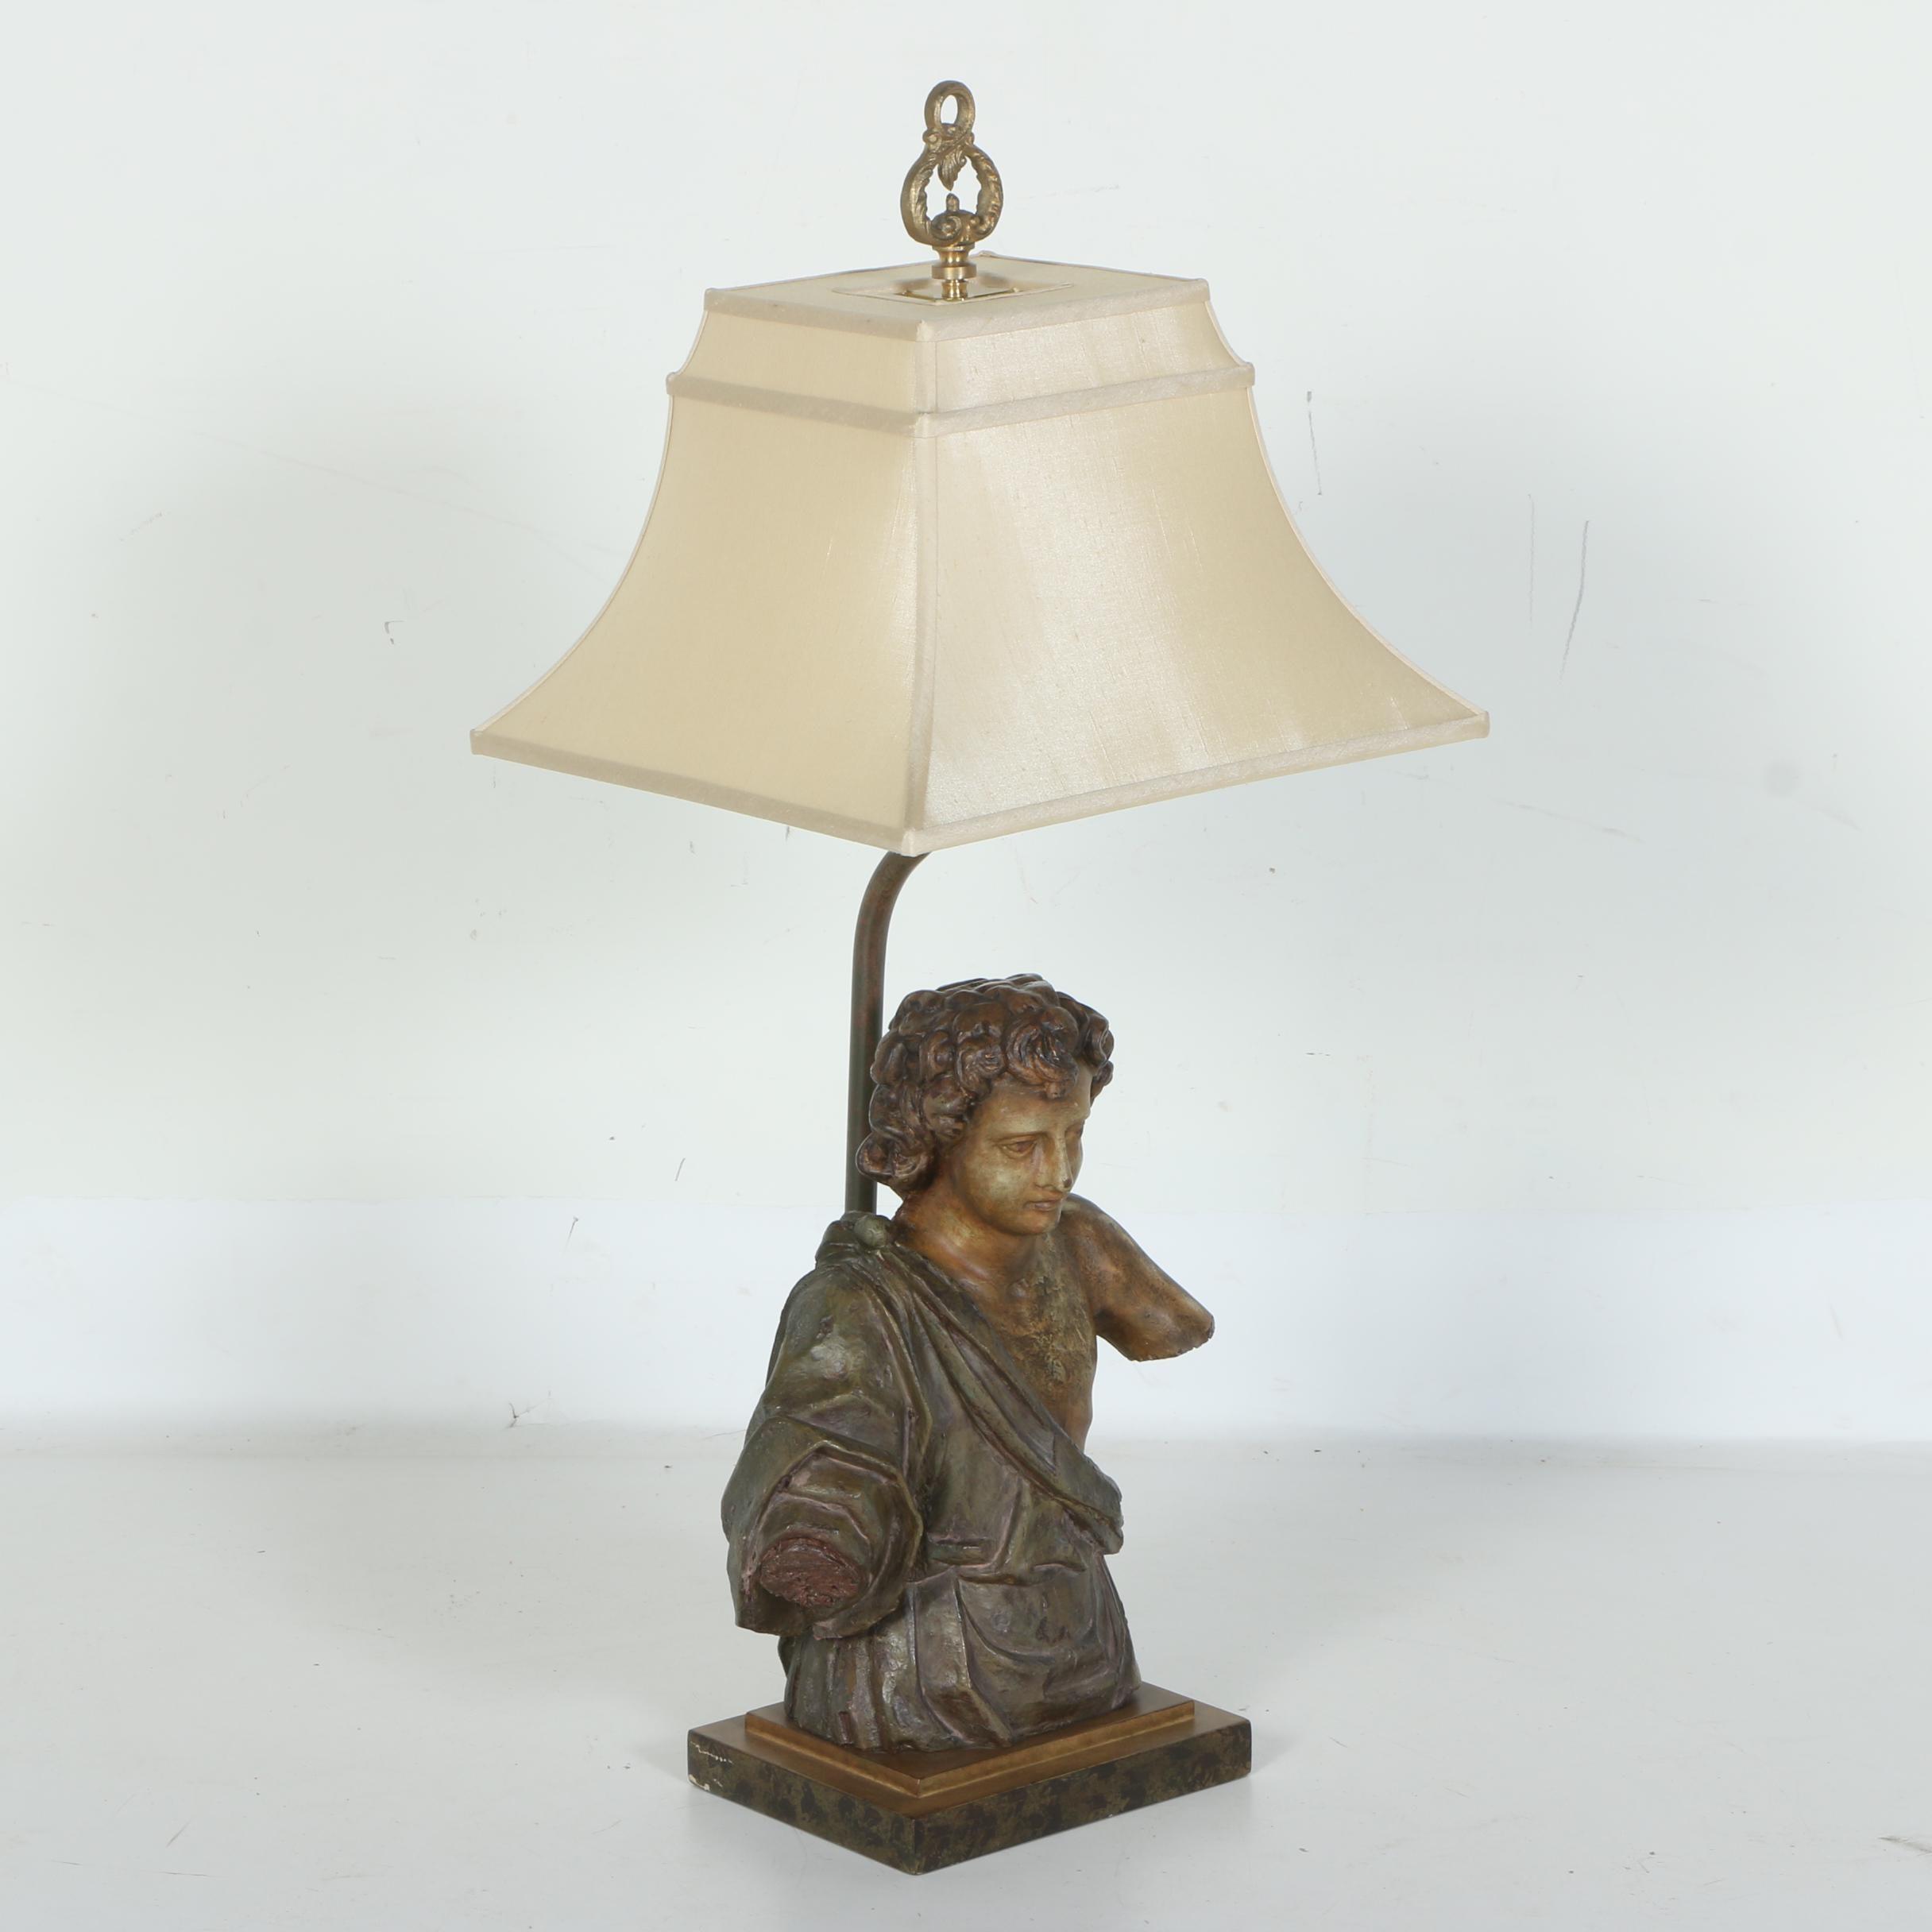 John - Richard Figural Table Lamp